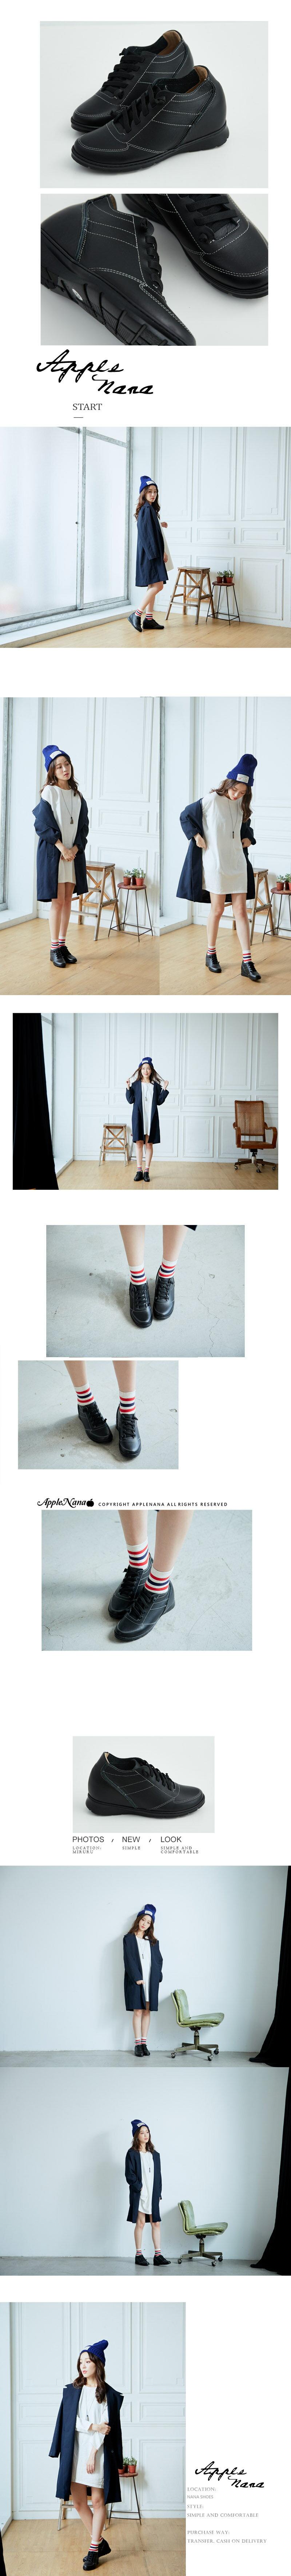 AppleNana蘋果奈奈【QT219911580】時尚部落客運動風潮隱形內增高真皮氣墊鞋 5